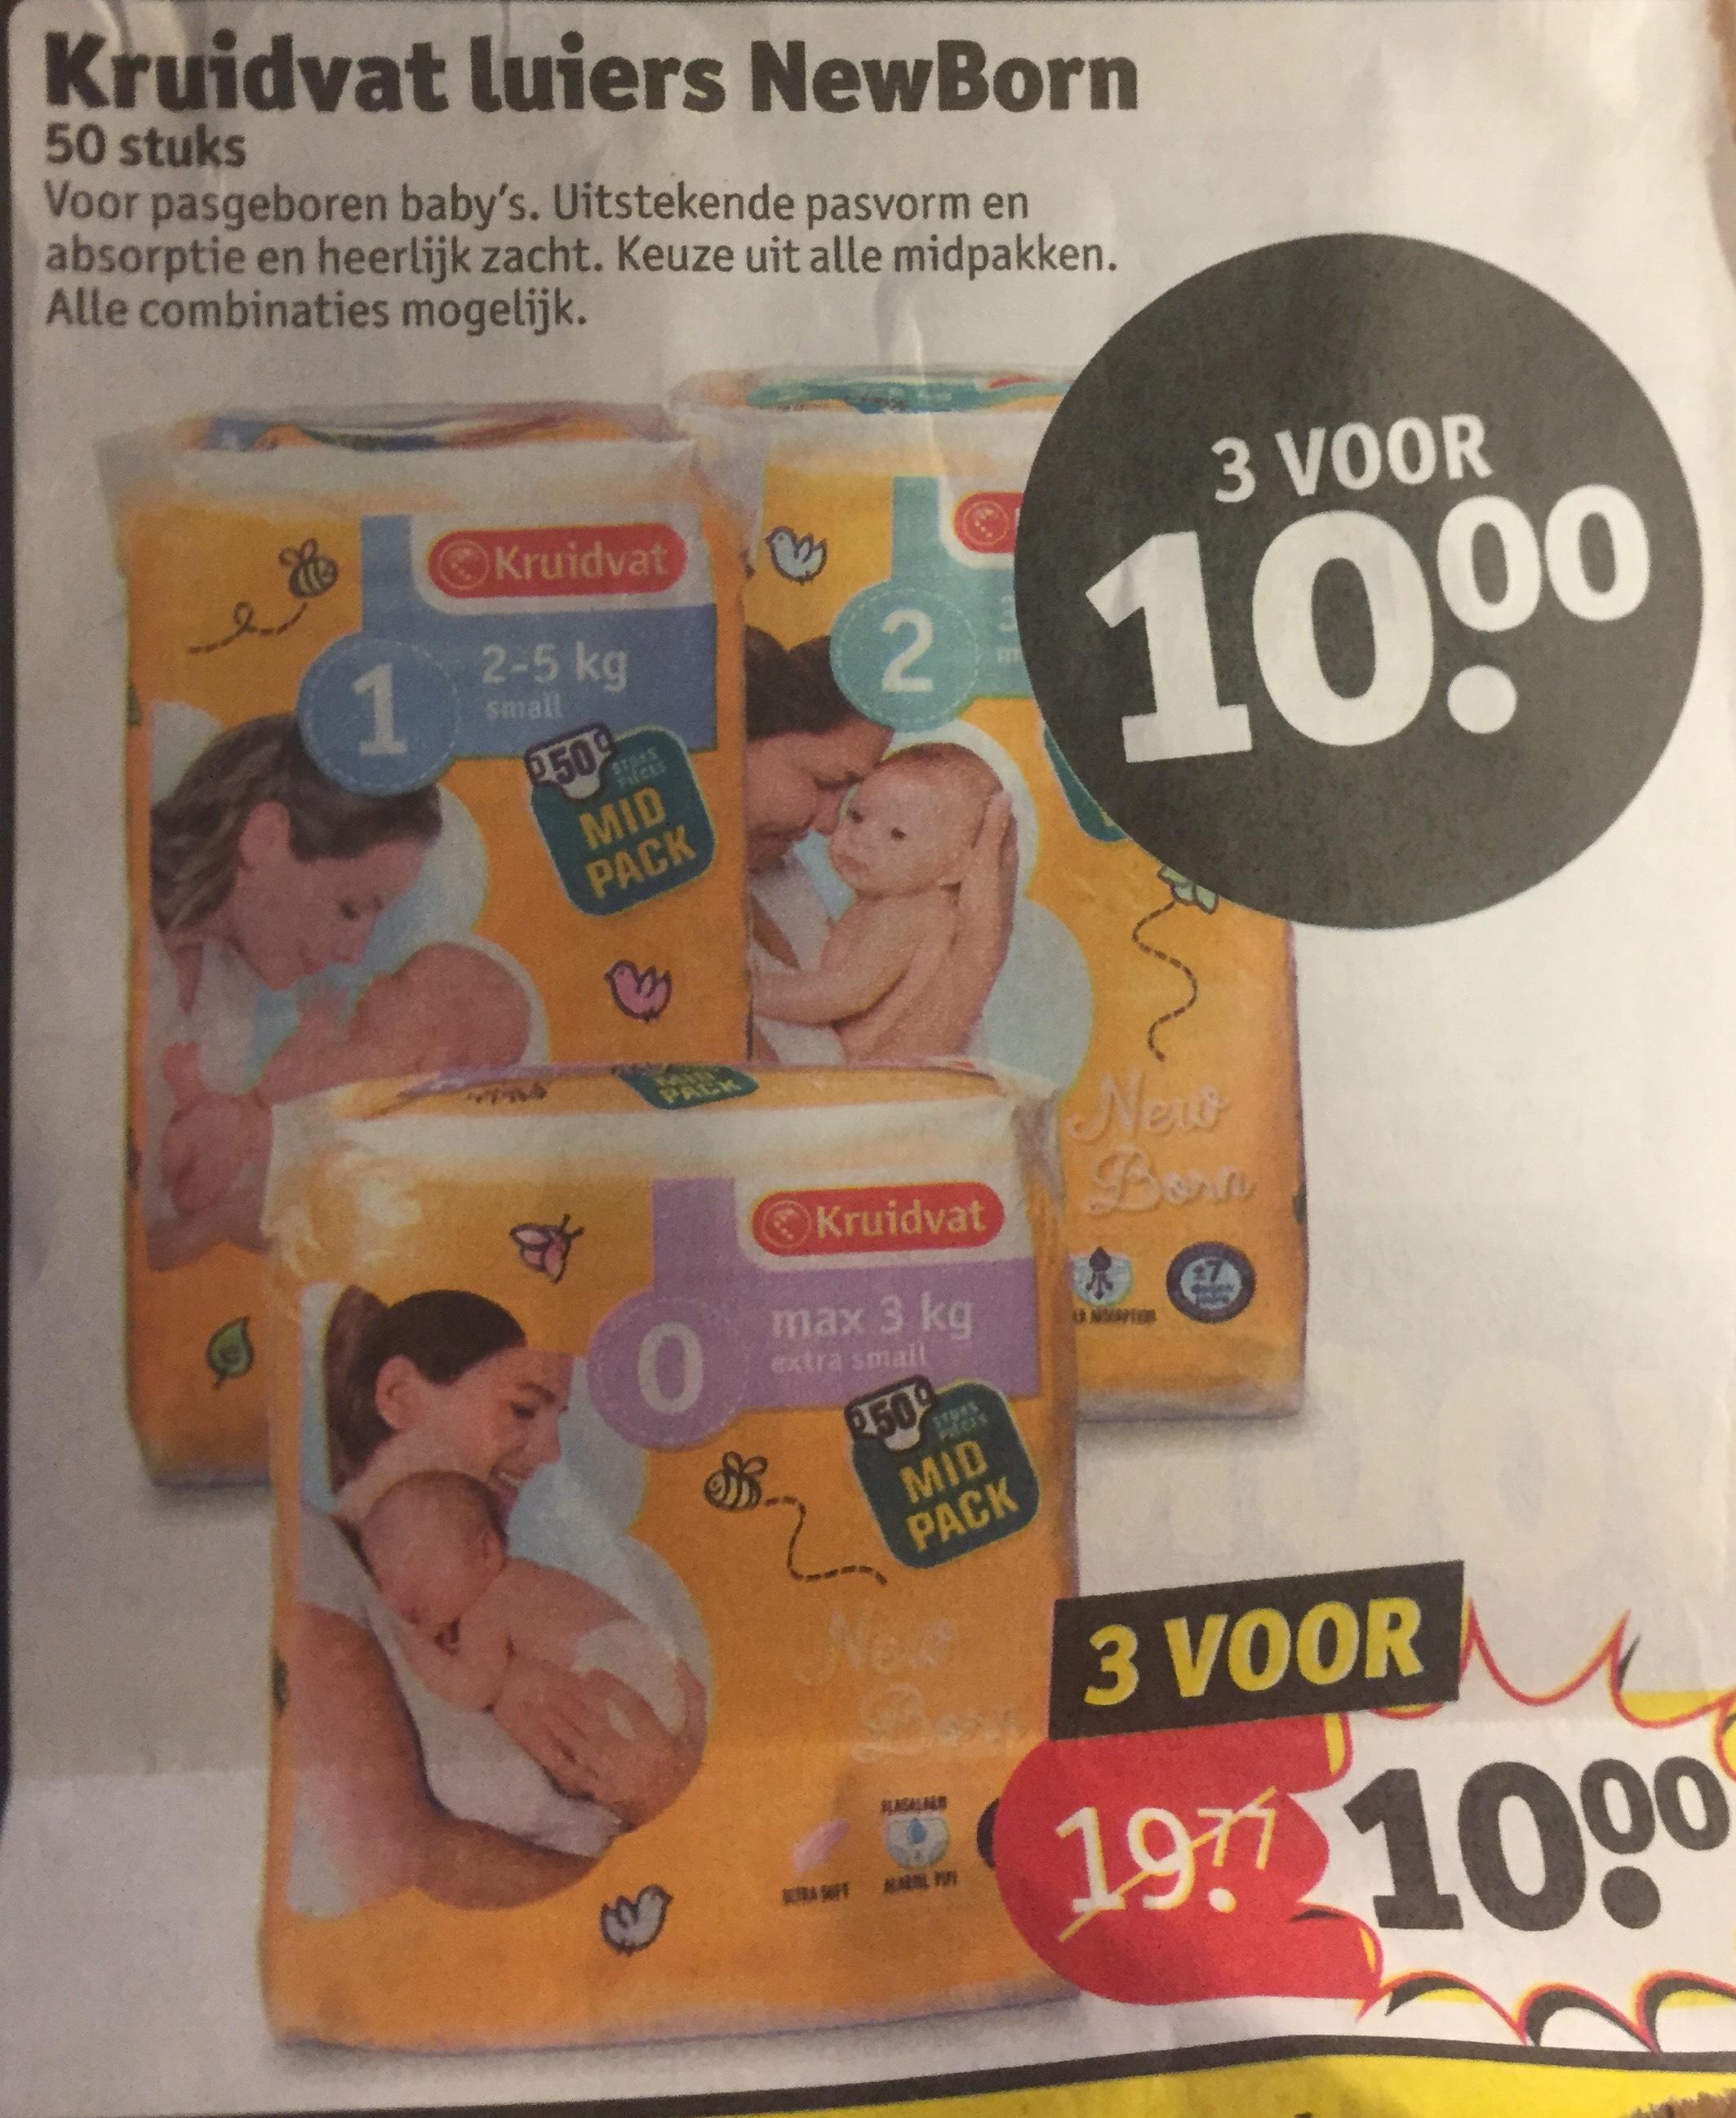 Kruidvat luiers newborn 3 pakken voor 10€